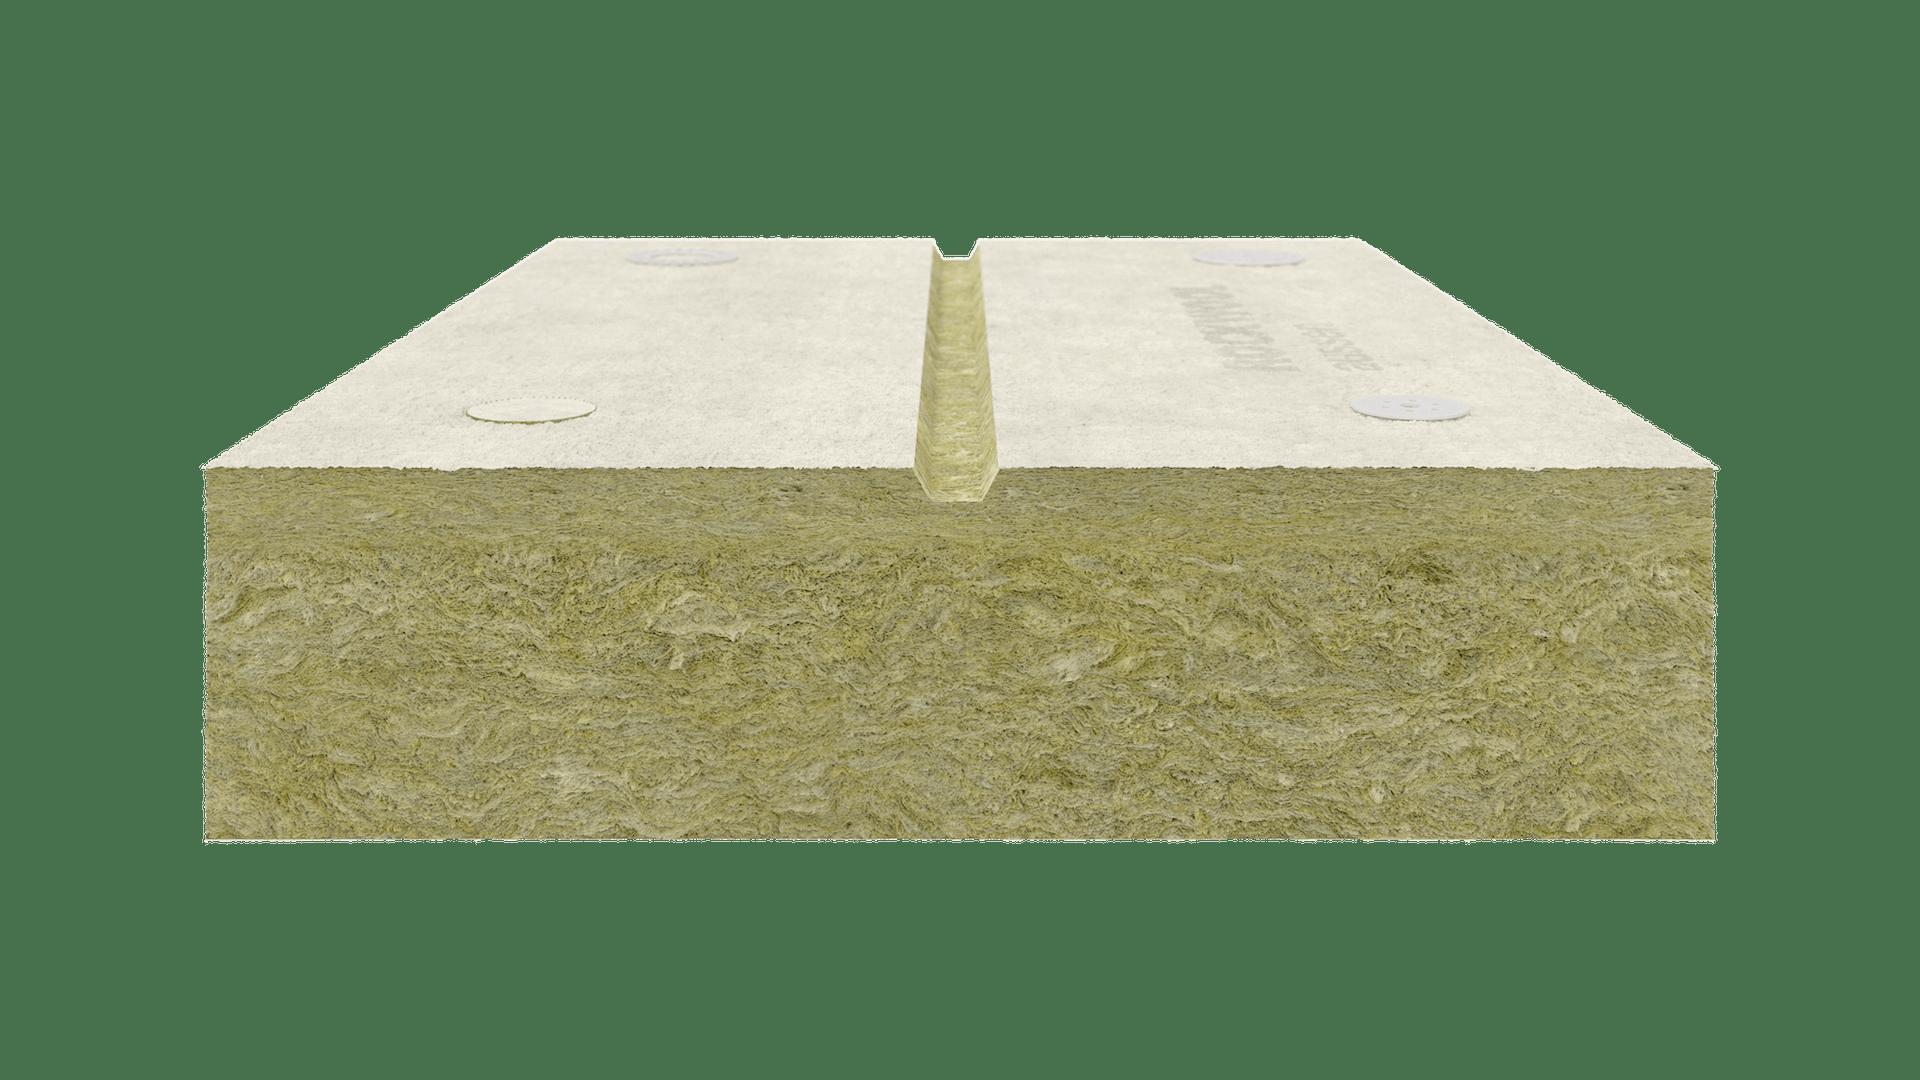 coverrock deko, product, rendering, facade, etics, wdvs, wärmedämmverbundsystem, bossendämmplatte, bossennut, germany, platte liegend, nut trapez breit, png